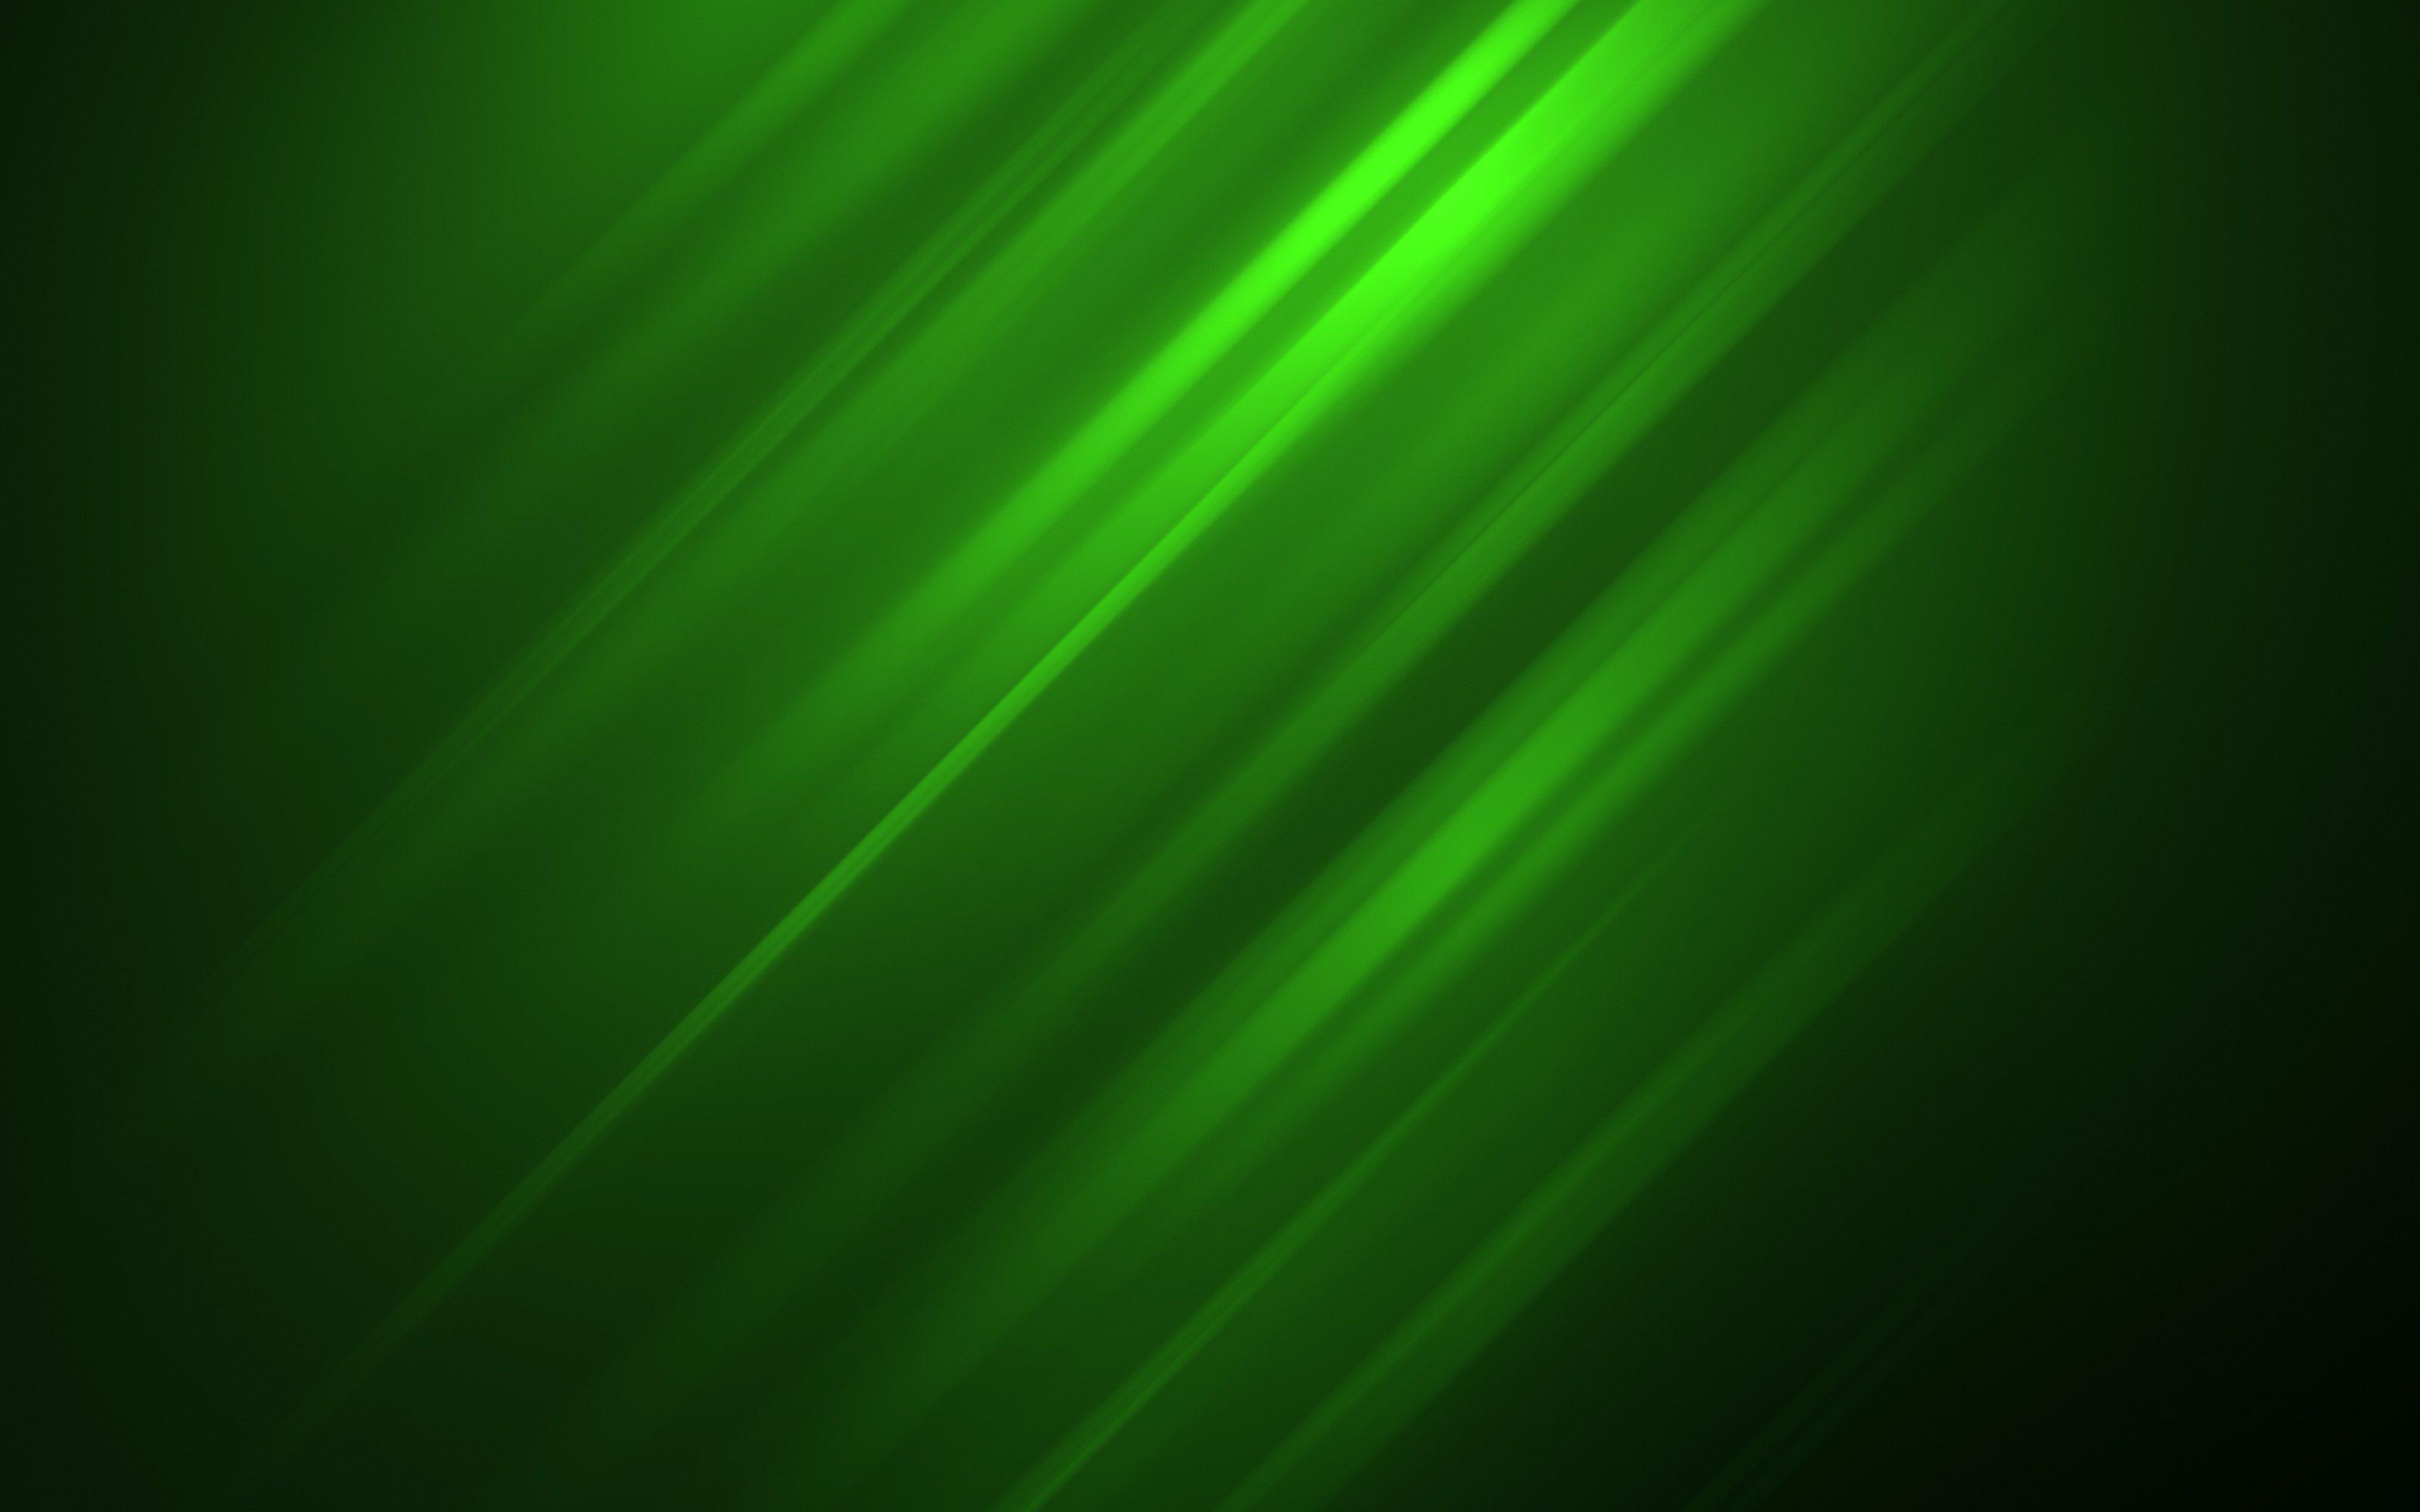 Dark Green Background - WallpaperSafari